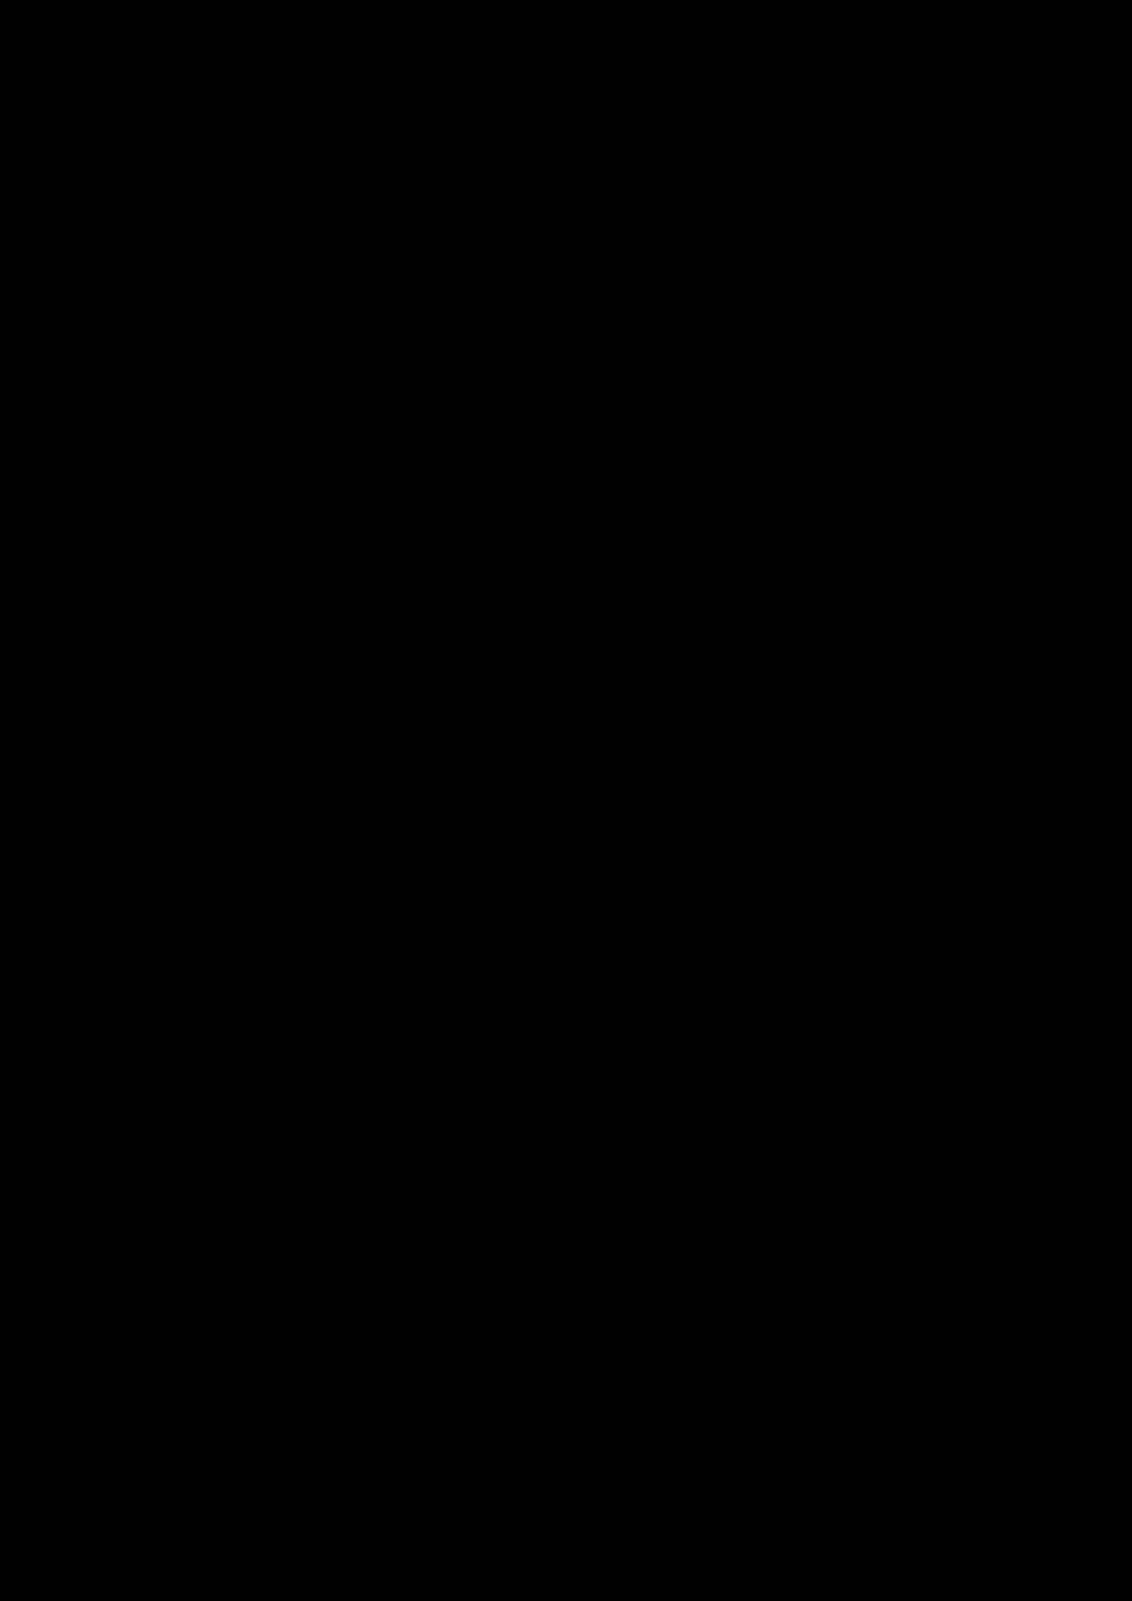 Belyiy sokol slide, Image 133